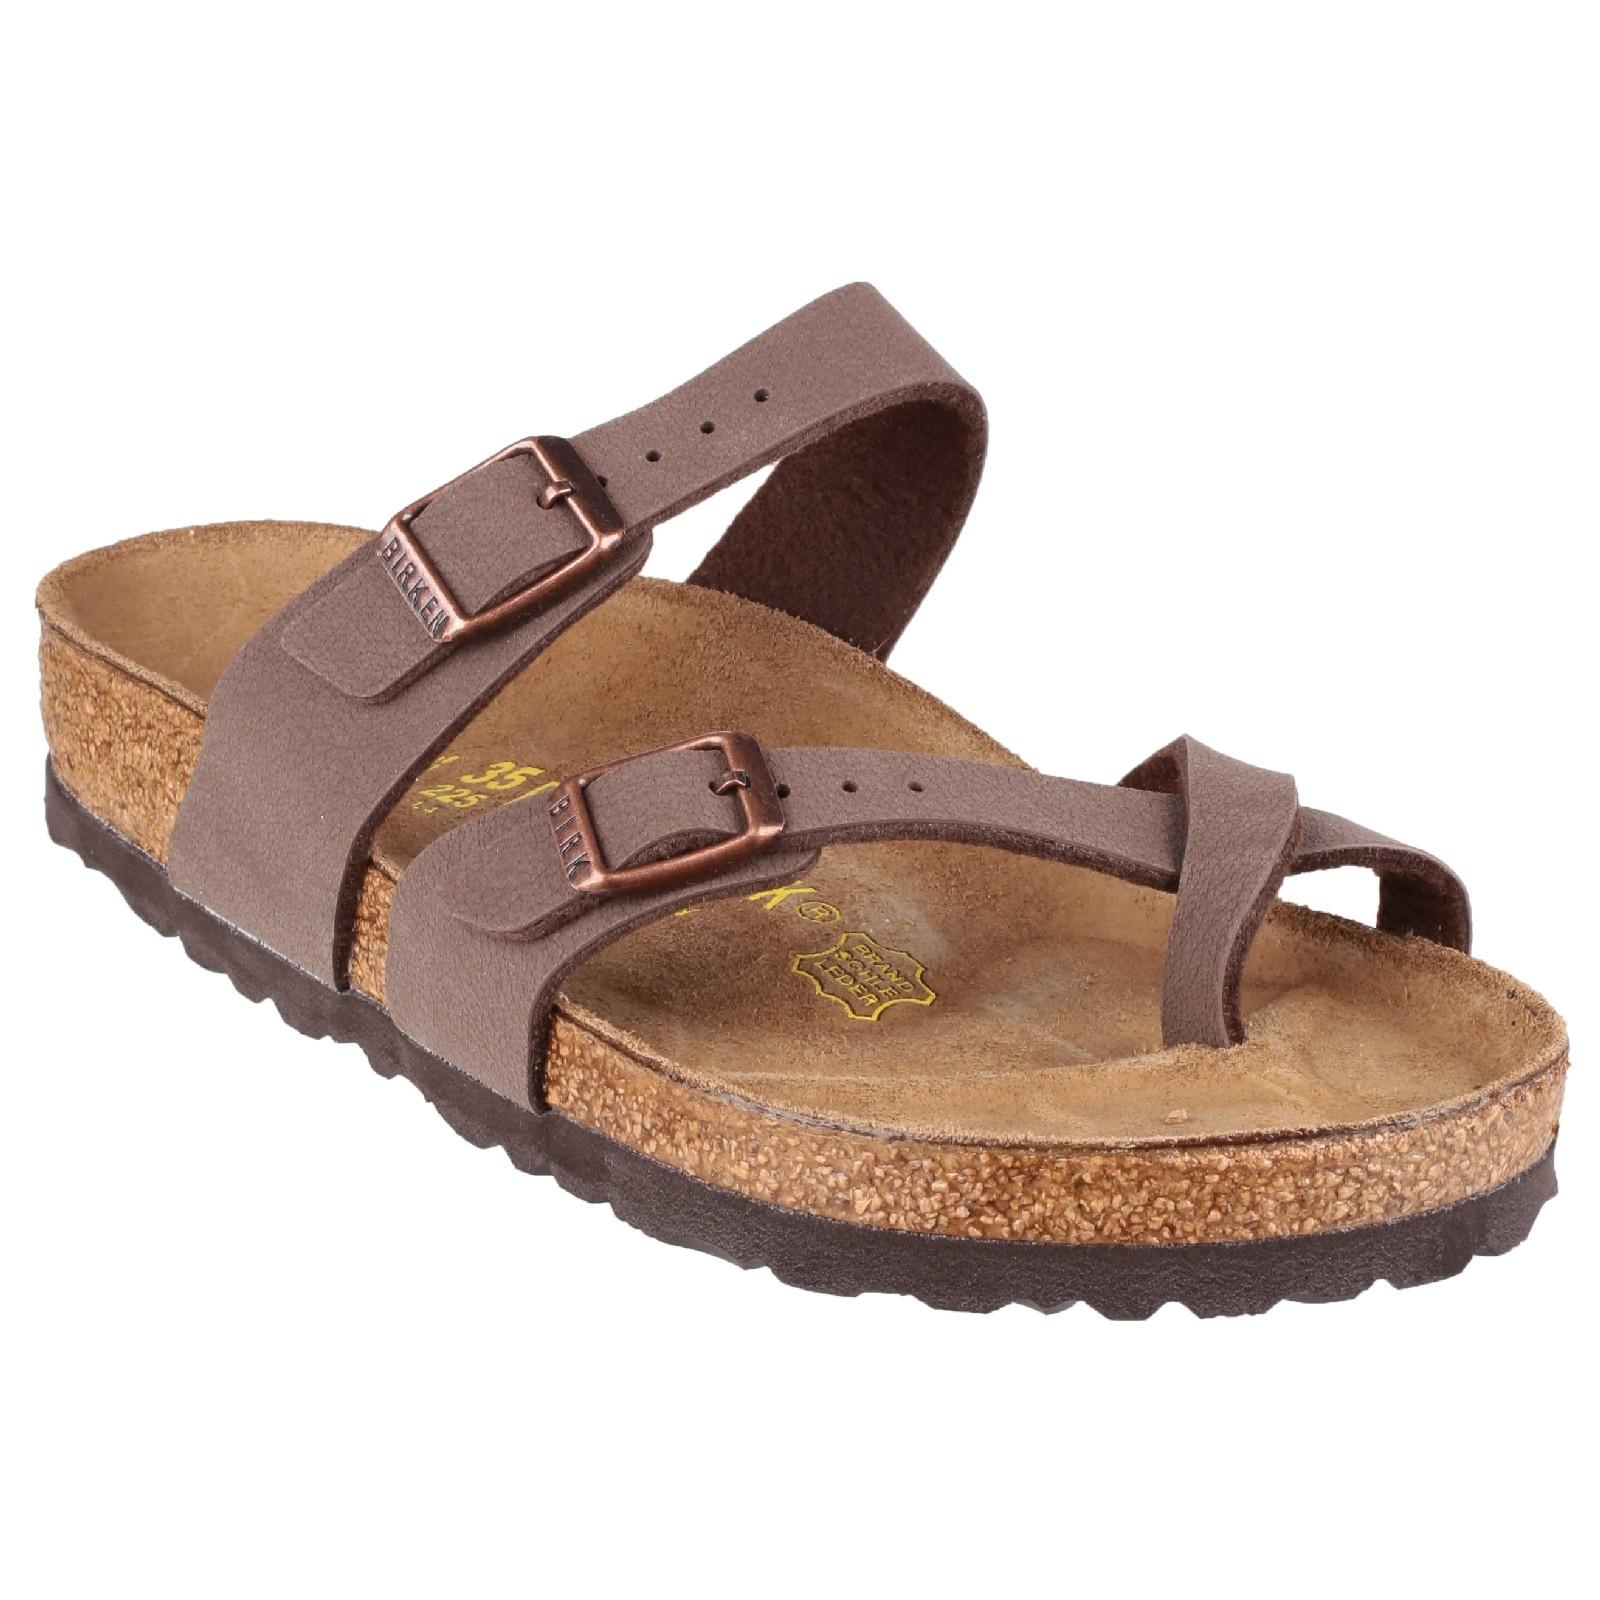 Birkenstock Womens/Ladies Mayari Toe Loop Summer Sandals